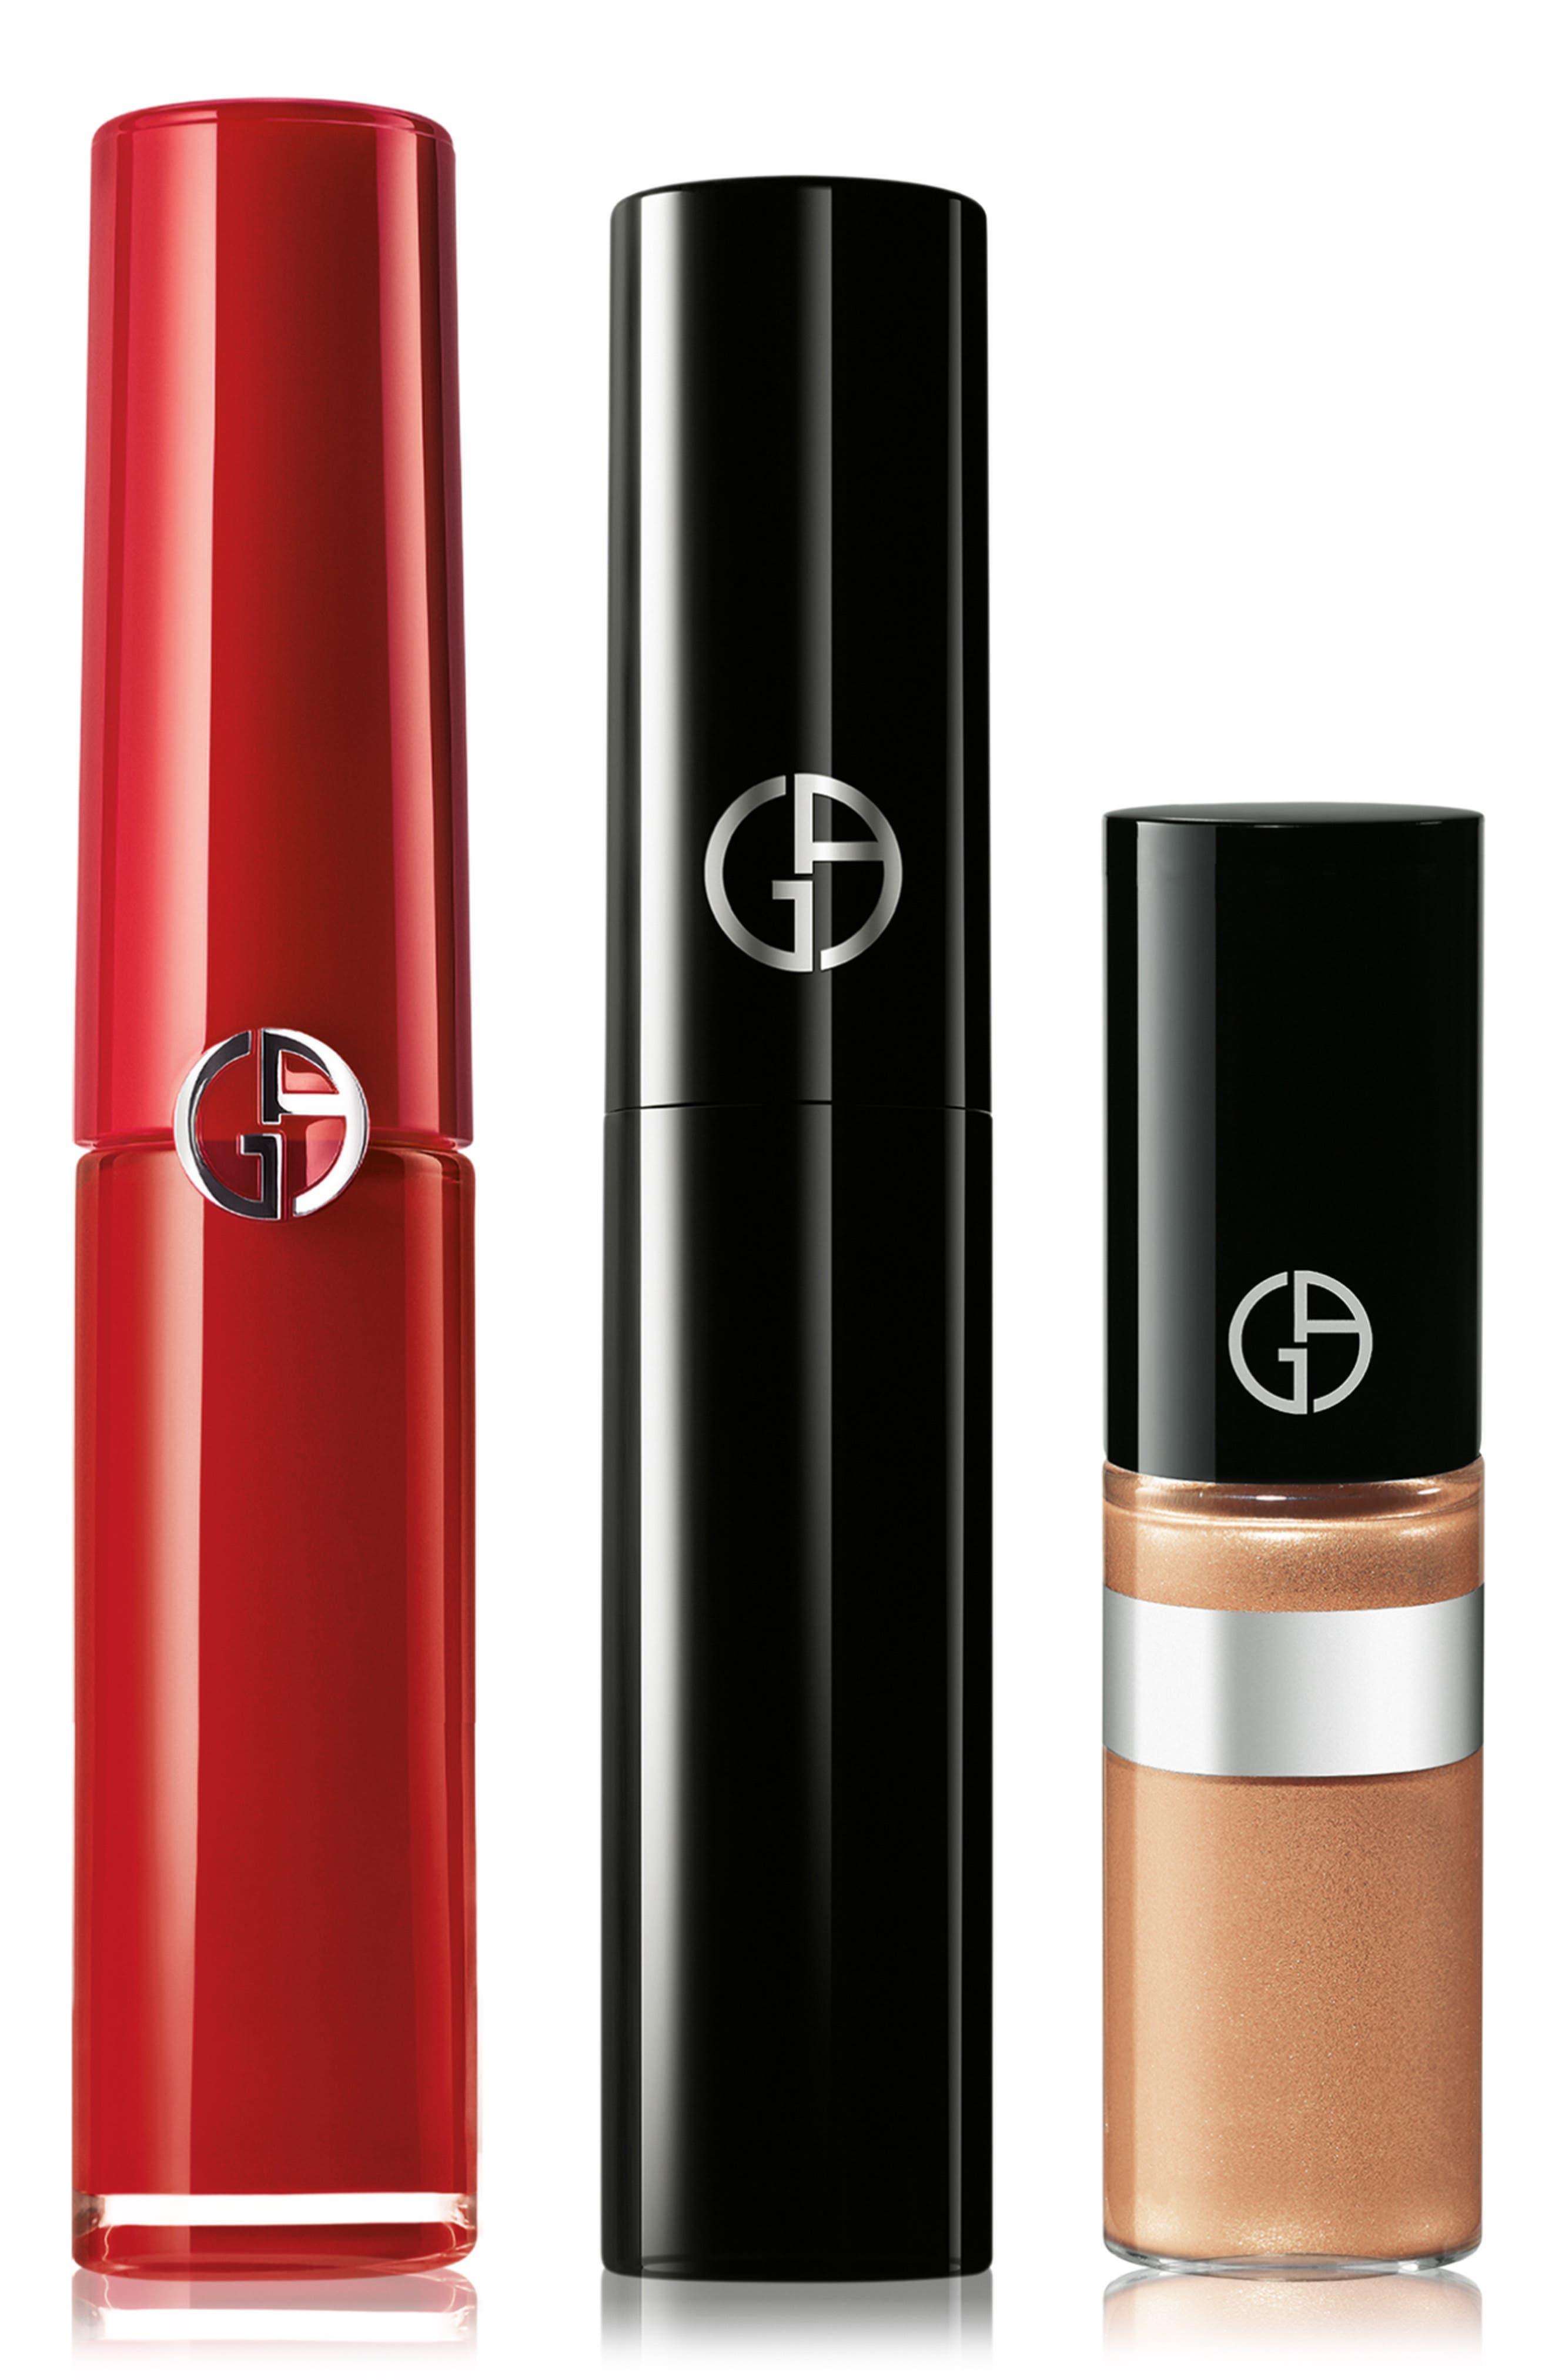 Travel Size Lip Maestro Liquid Lipstick Set-$53 Value | Nordstrom